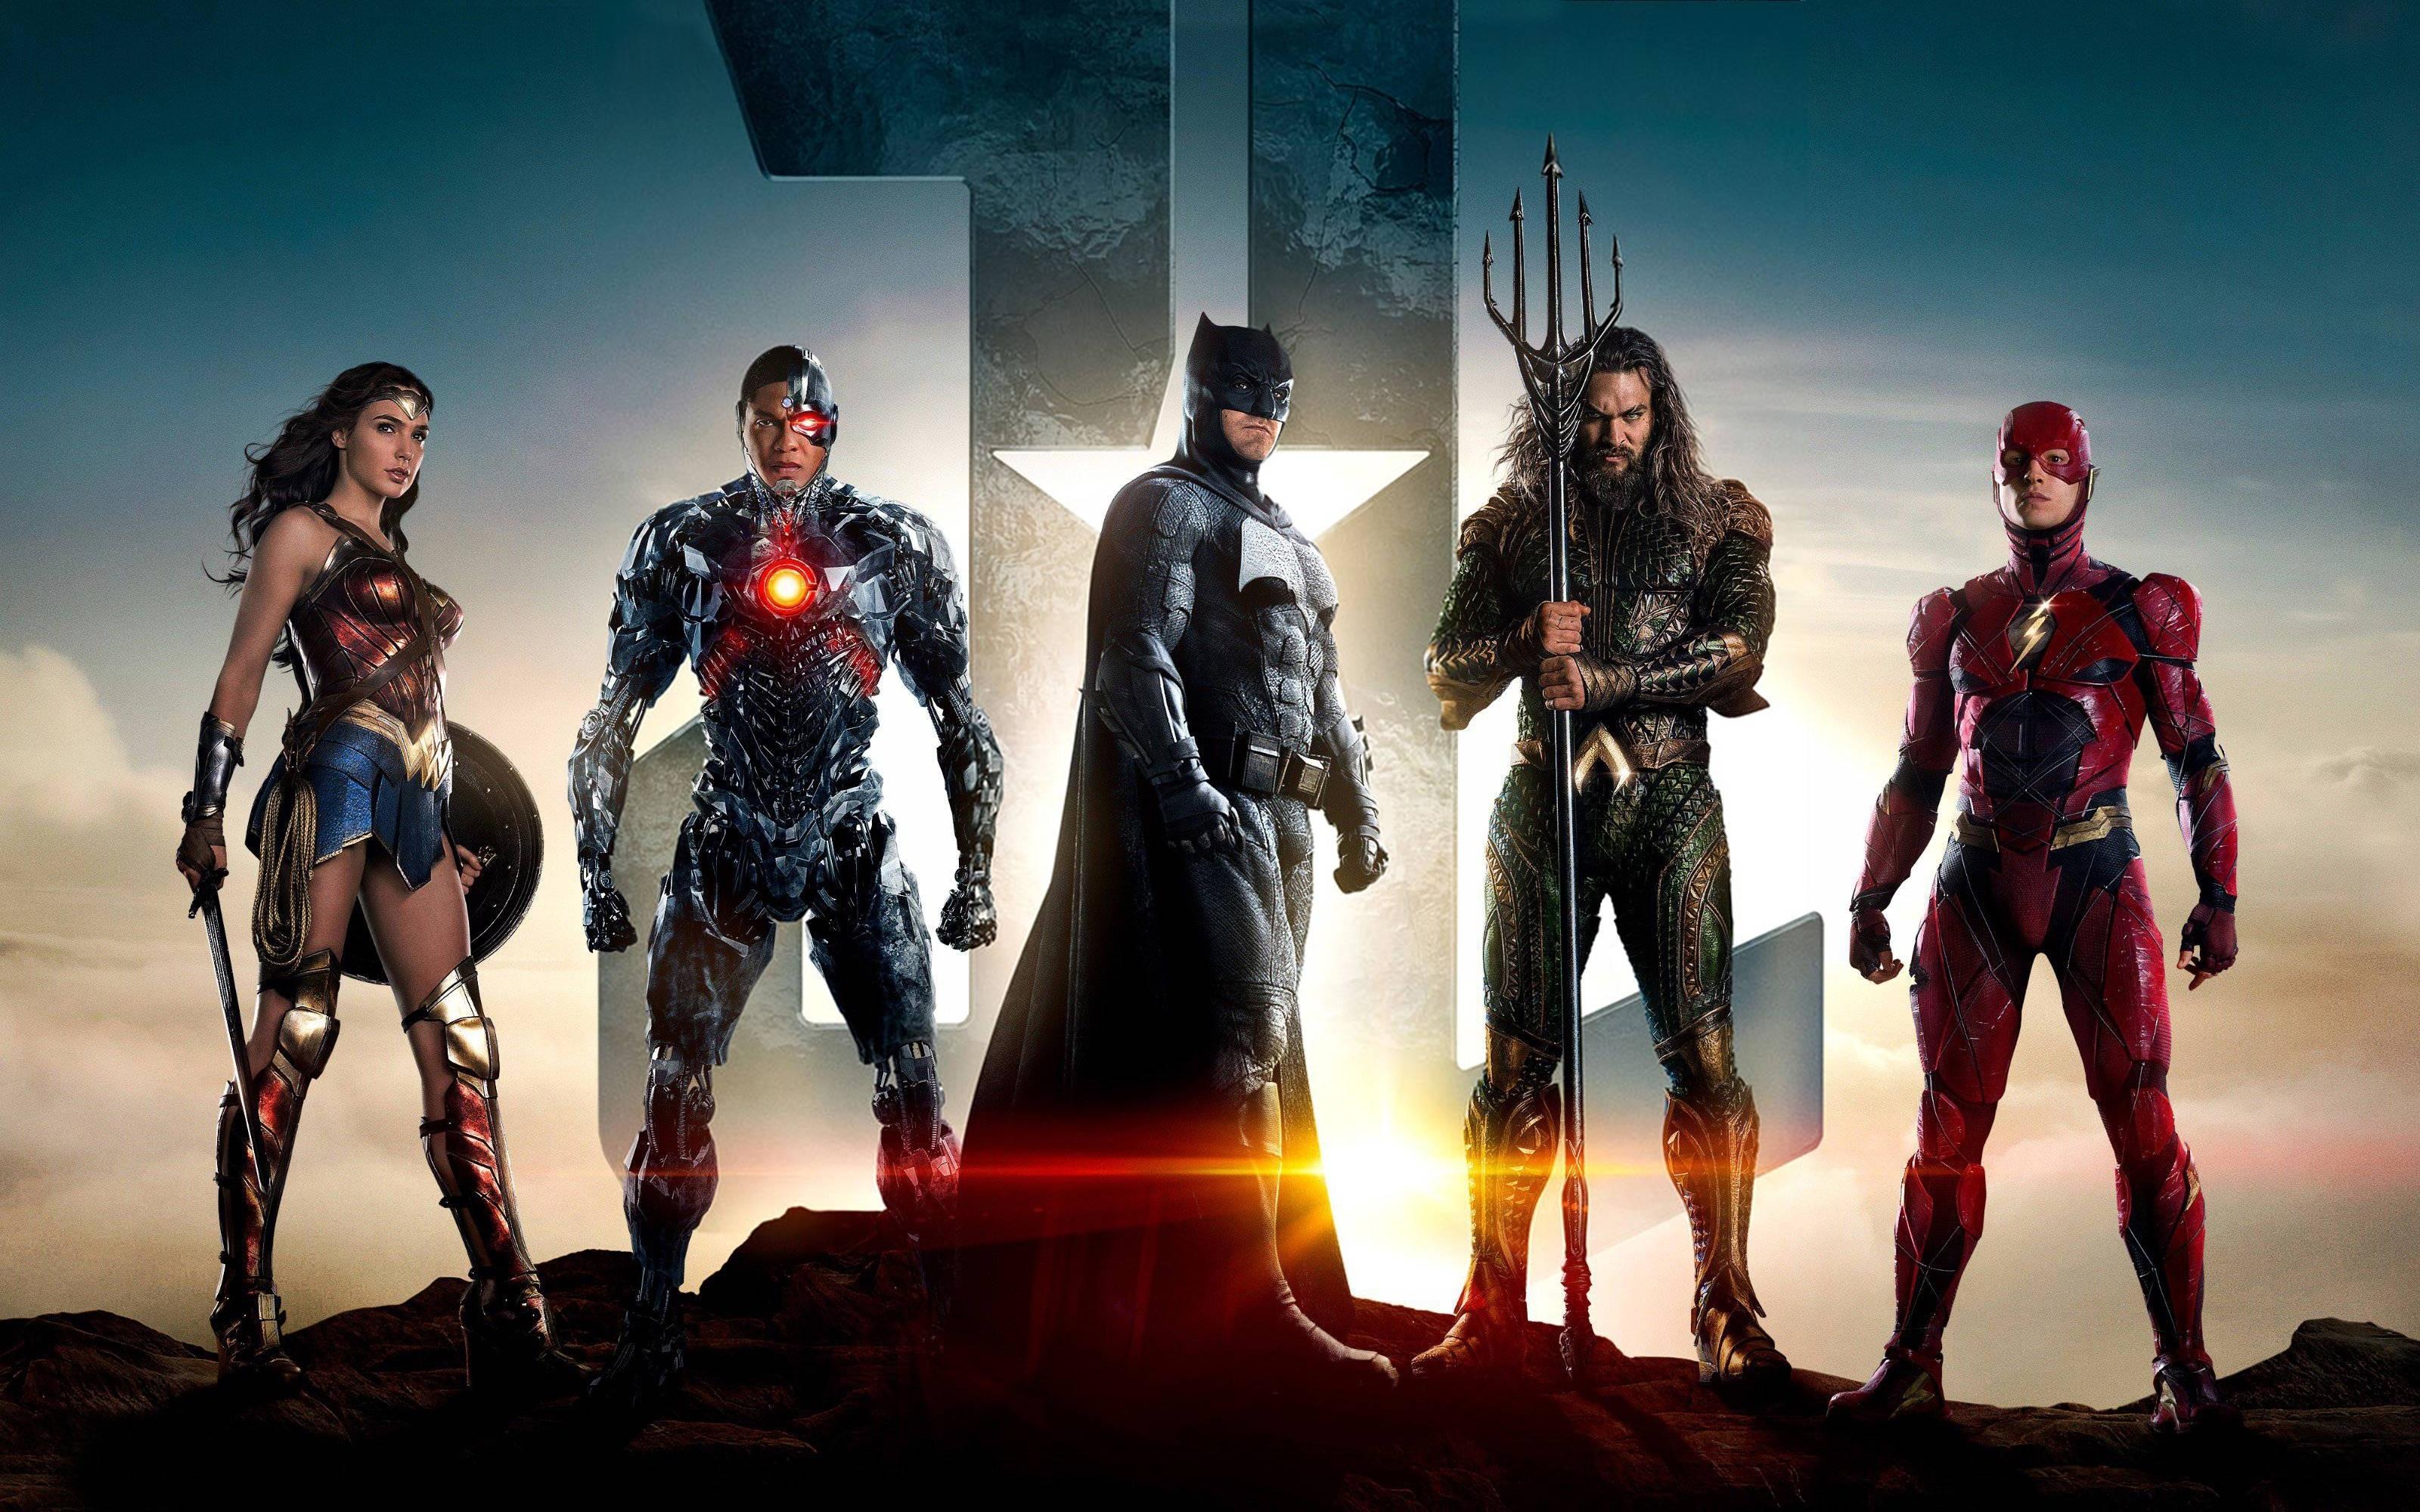 justice league batman aquaman flash cyborg wonder woman 4k, hd